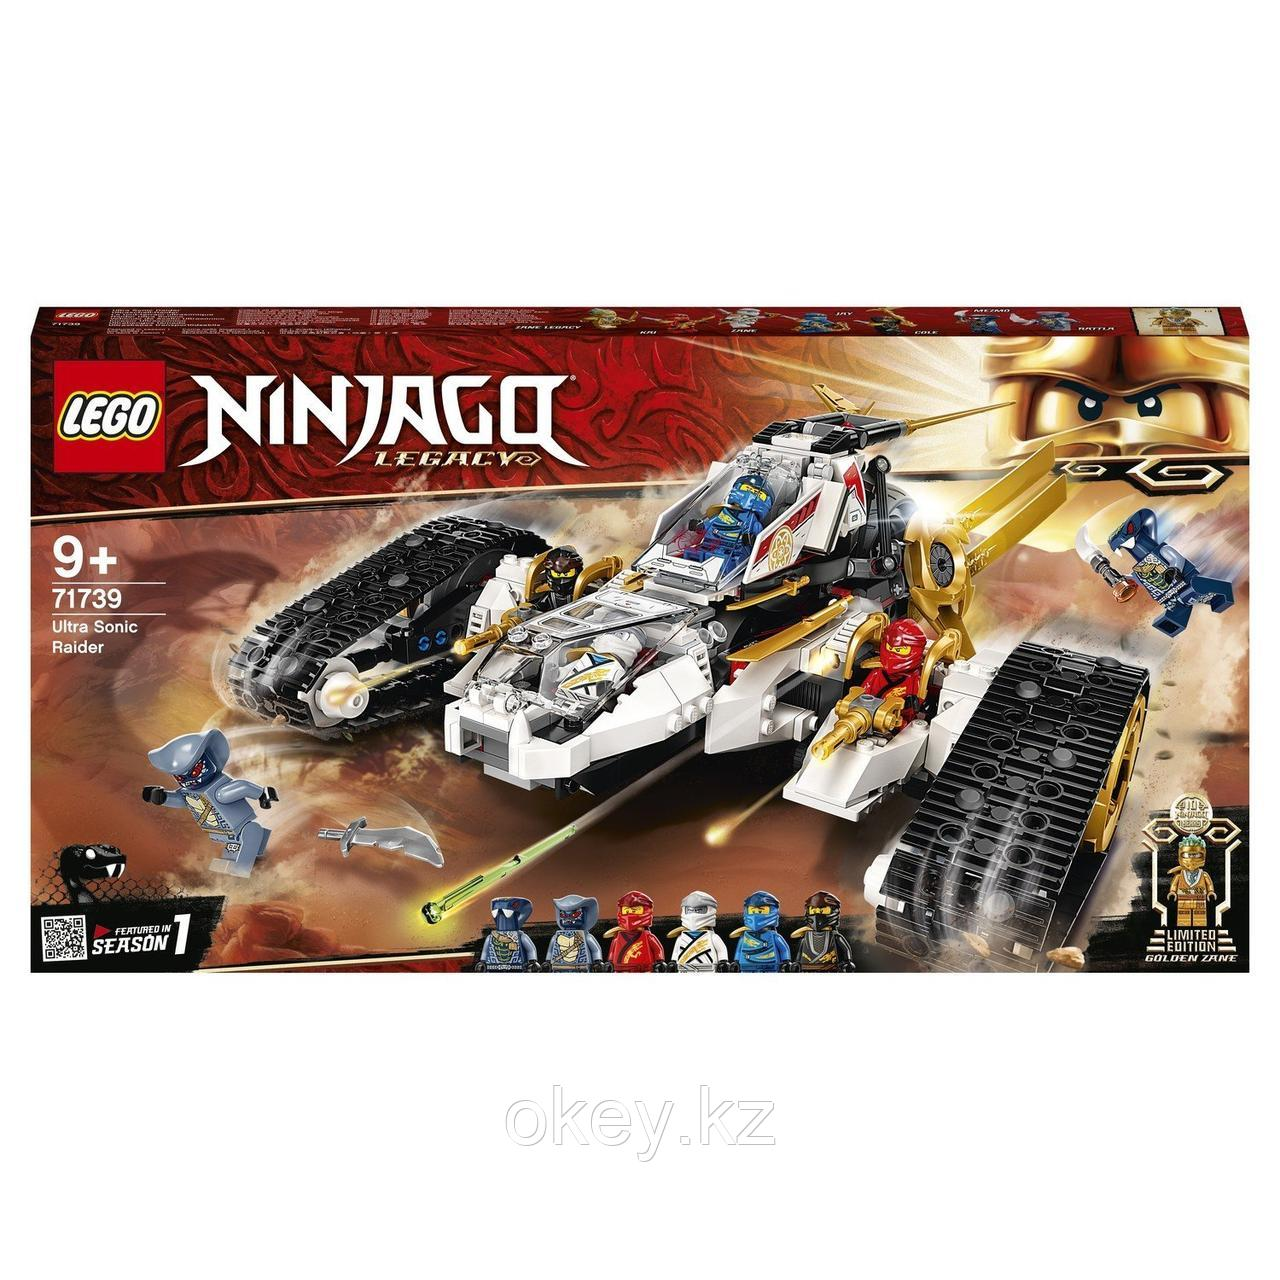 LEGO Ninjago: Сверхзвуковой самолёт 71739